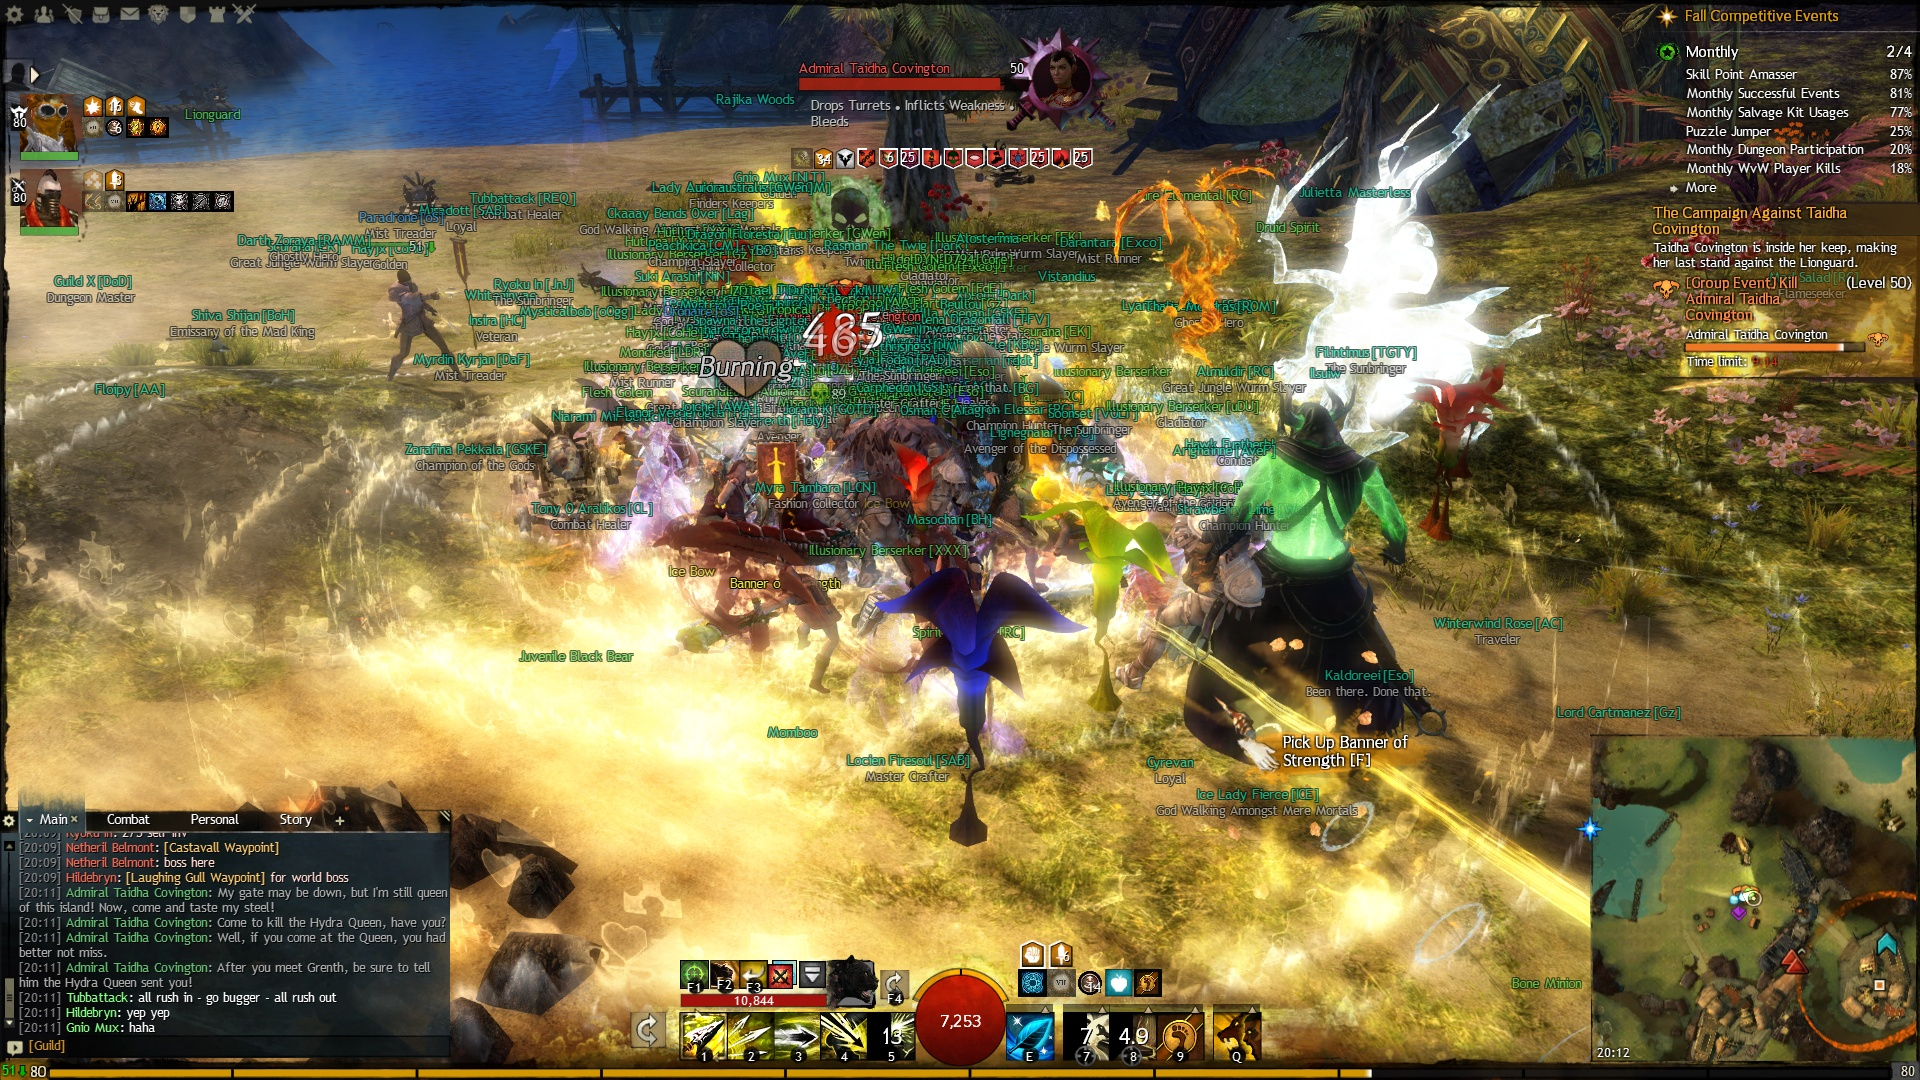 Guild Wars 2 - Taidha Boss Battle